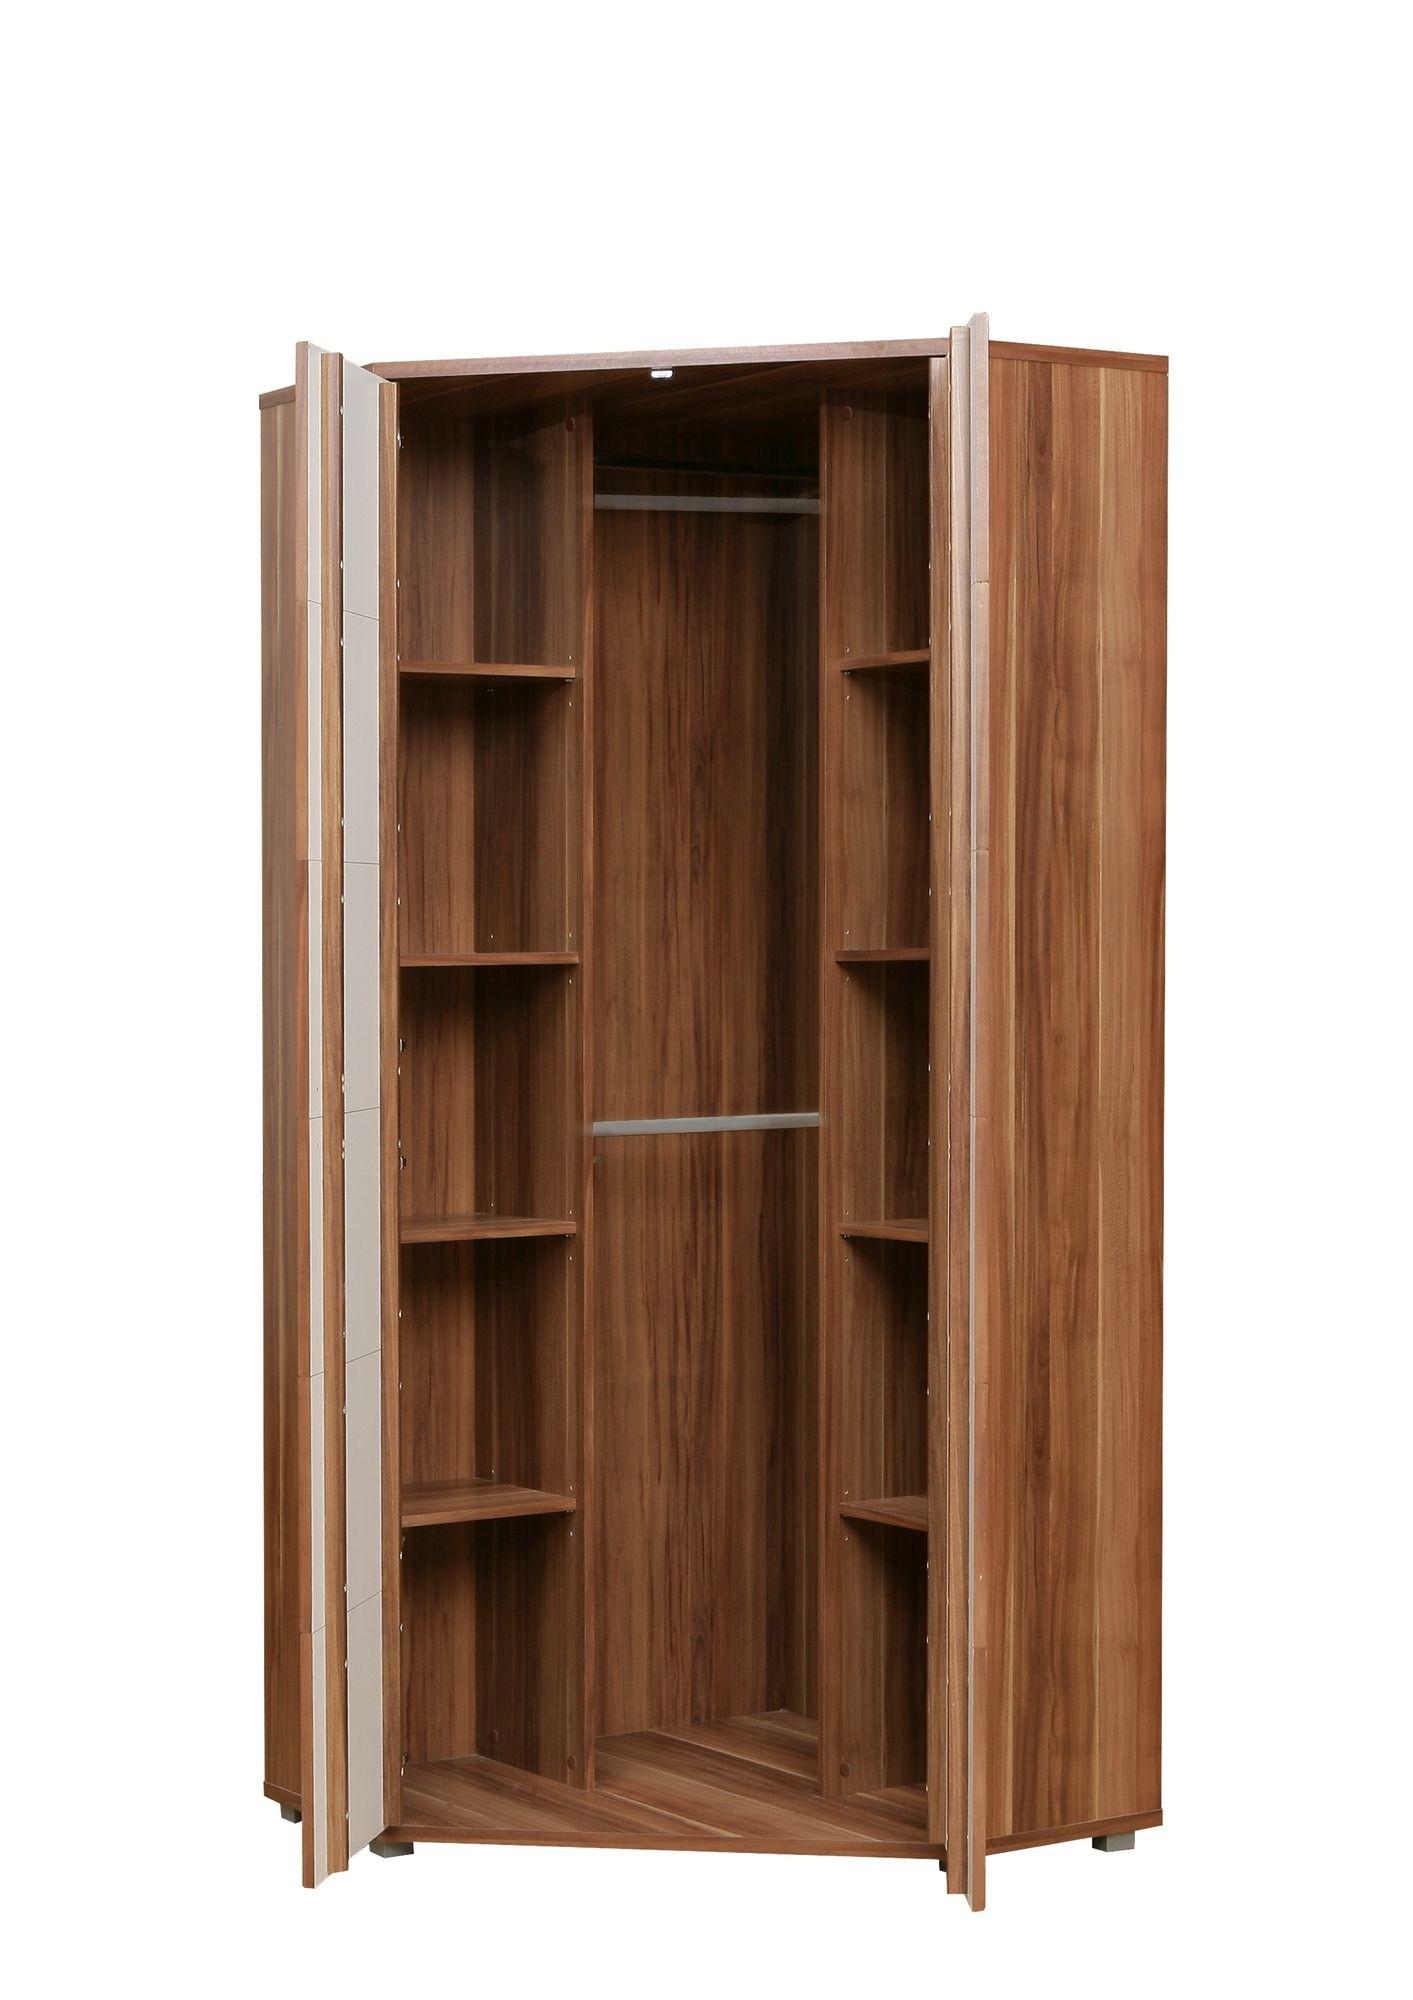 Etonnant Corner Armoire Save Big On Need A Corner Bedroom Armoire